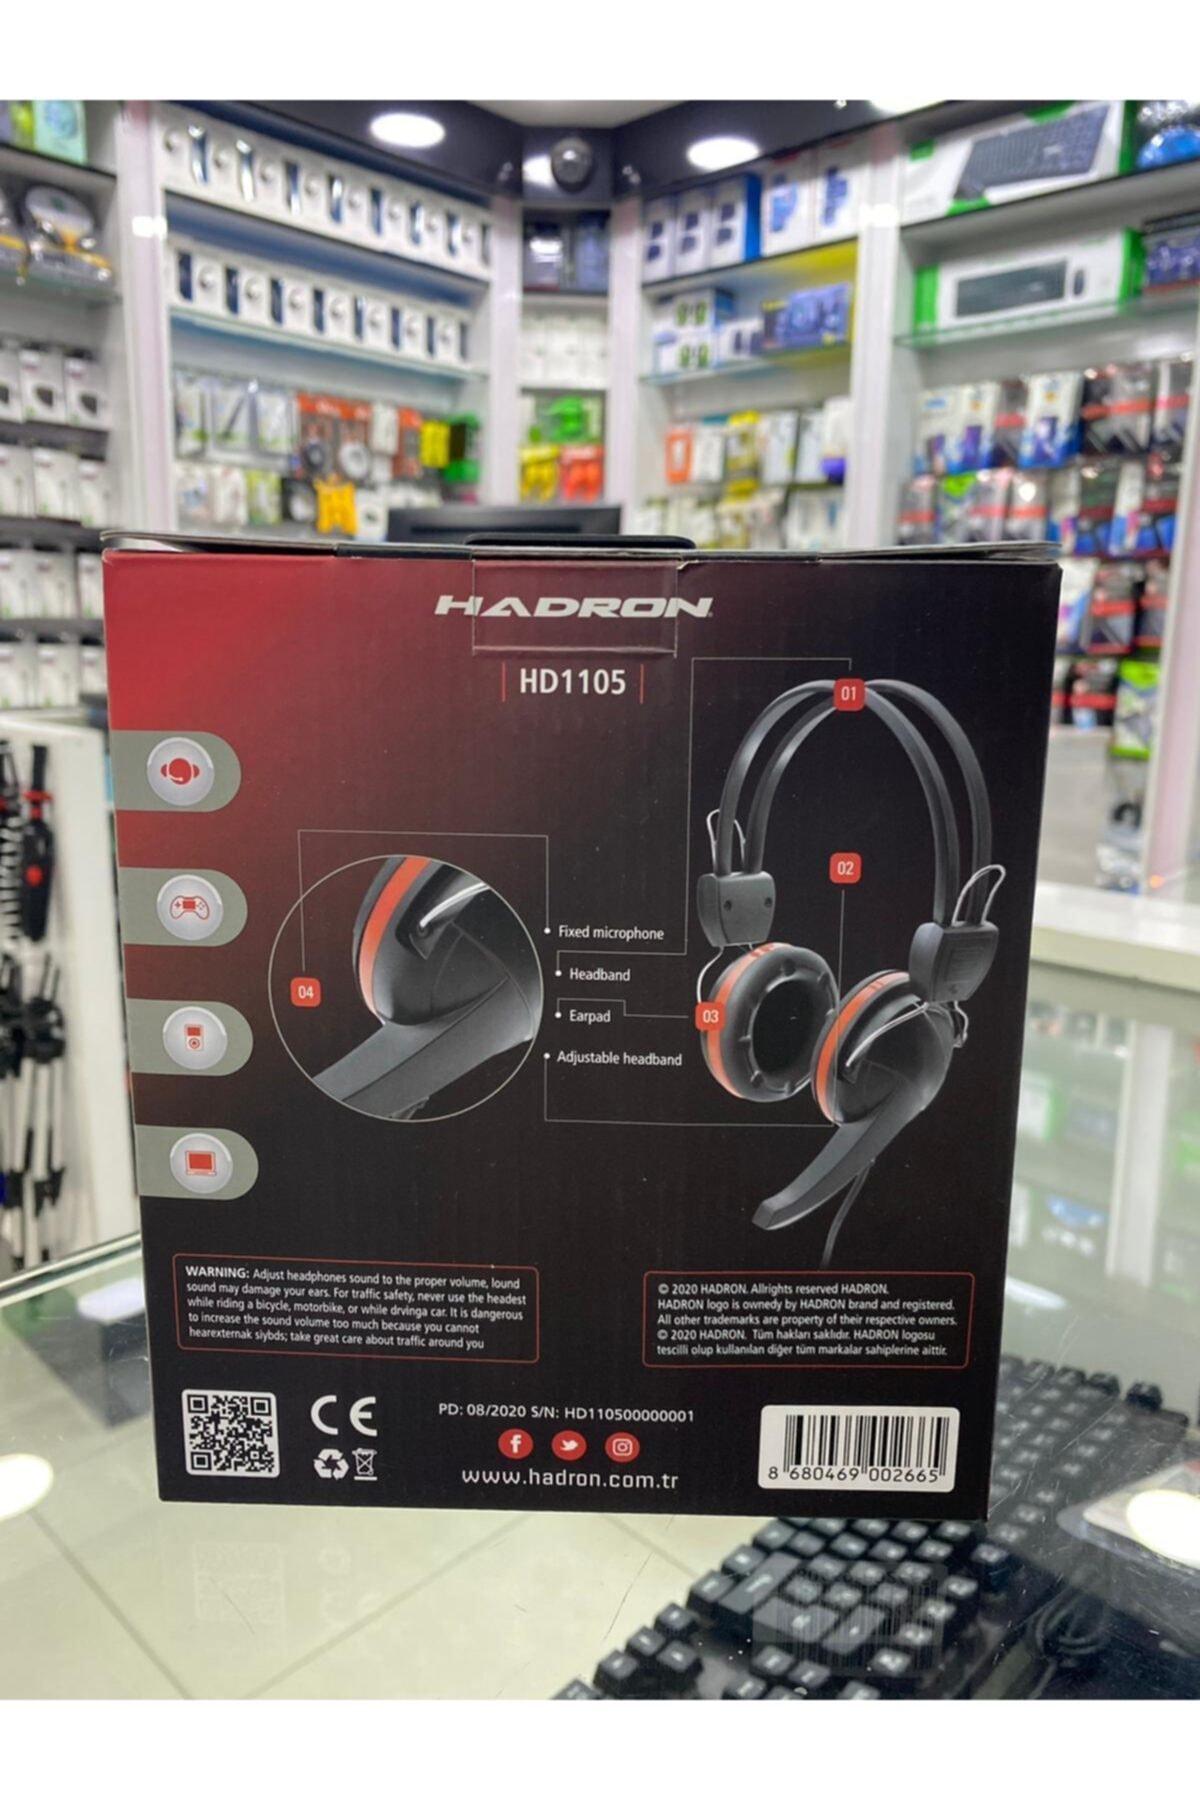 HADRON Hd1105 Mikrofonlu Gaming Kulaklık 2